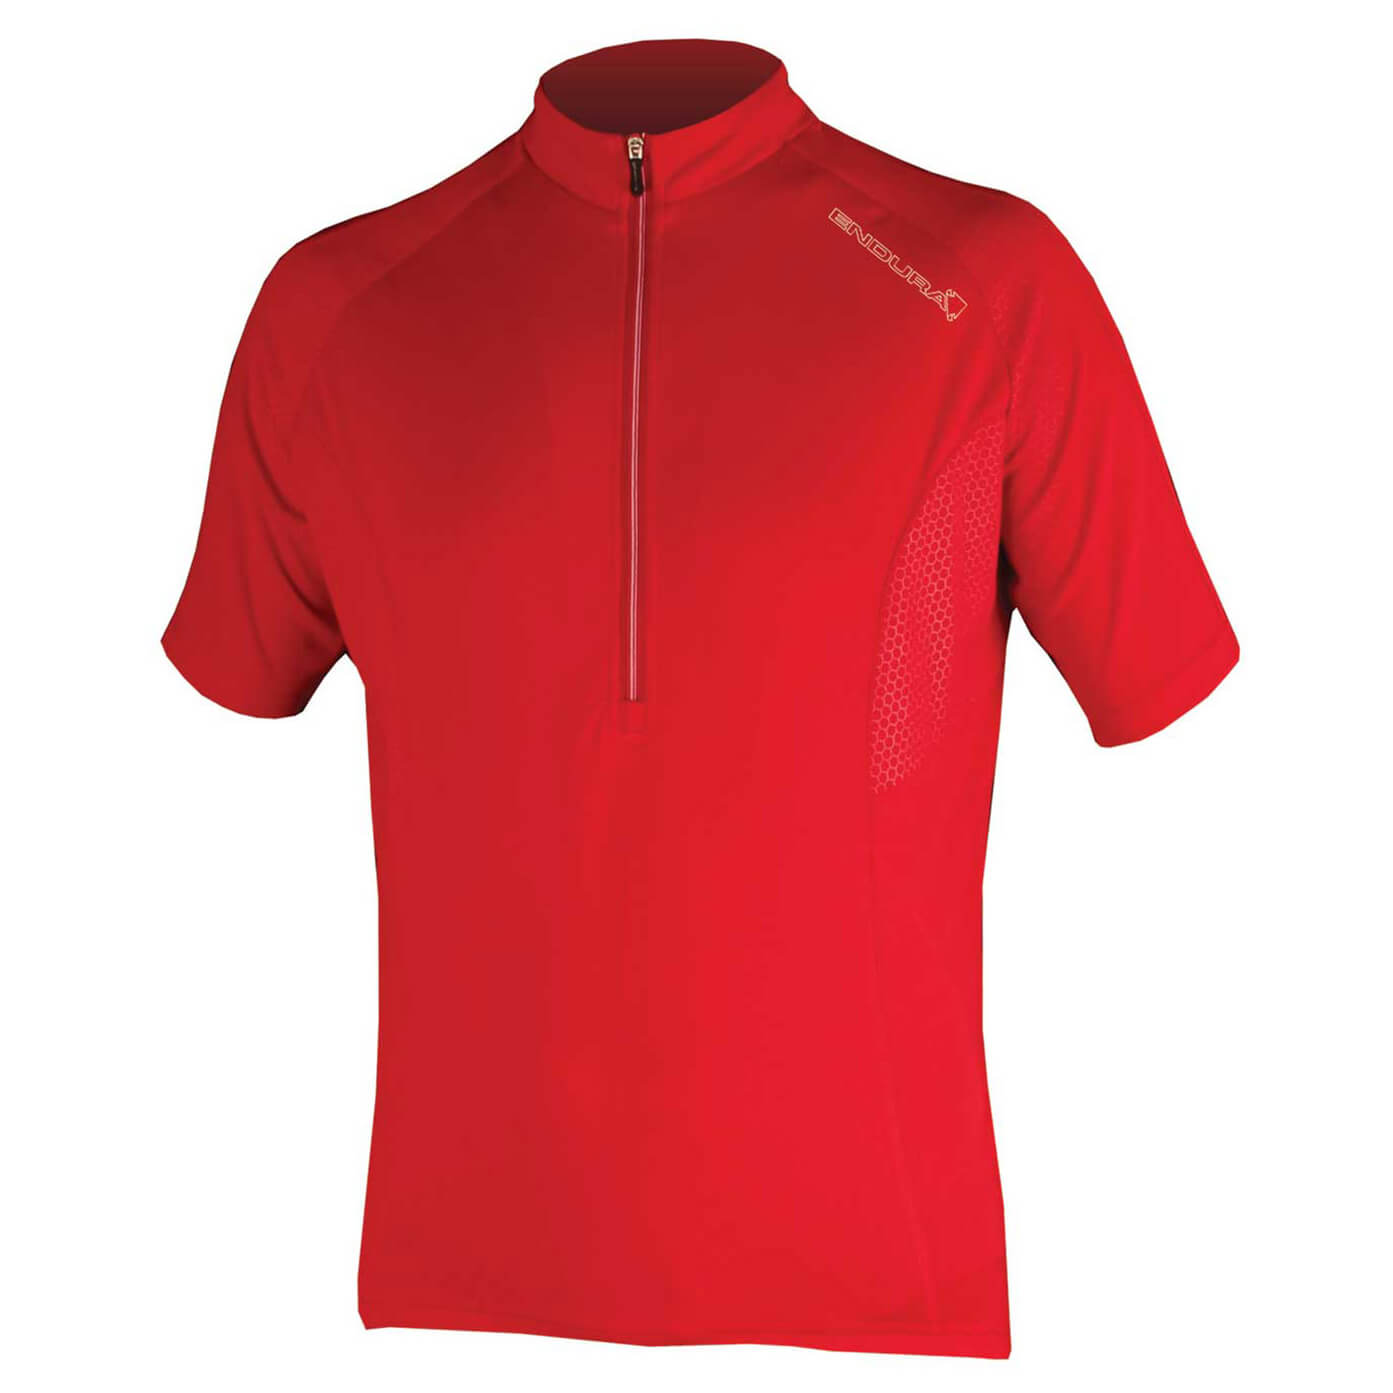 Endura Xtract Jersey S S - Cycling jersey Men s  391240d2b